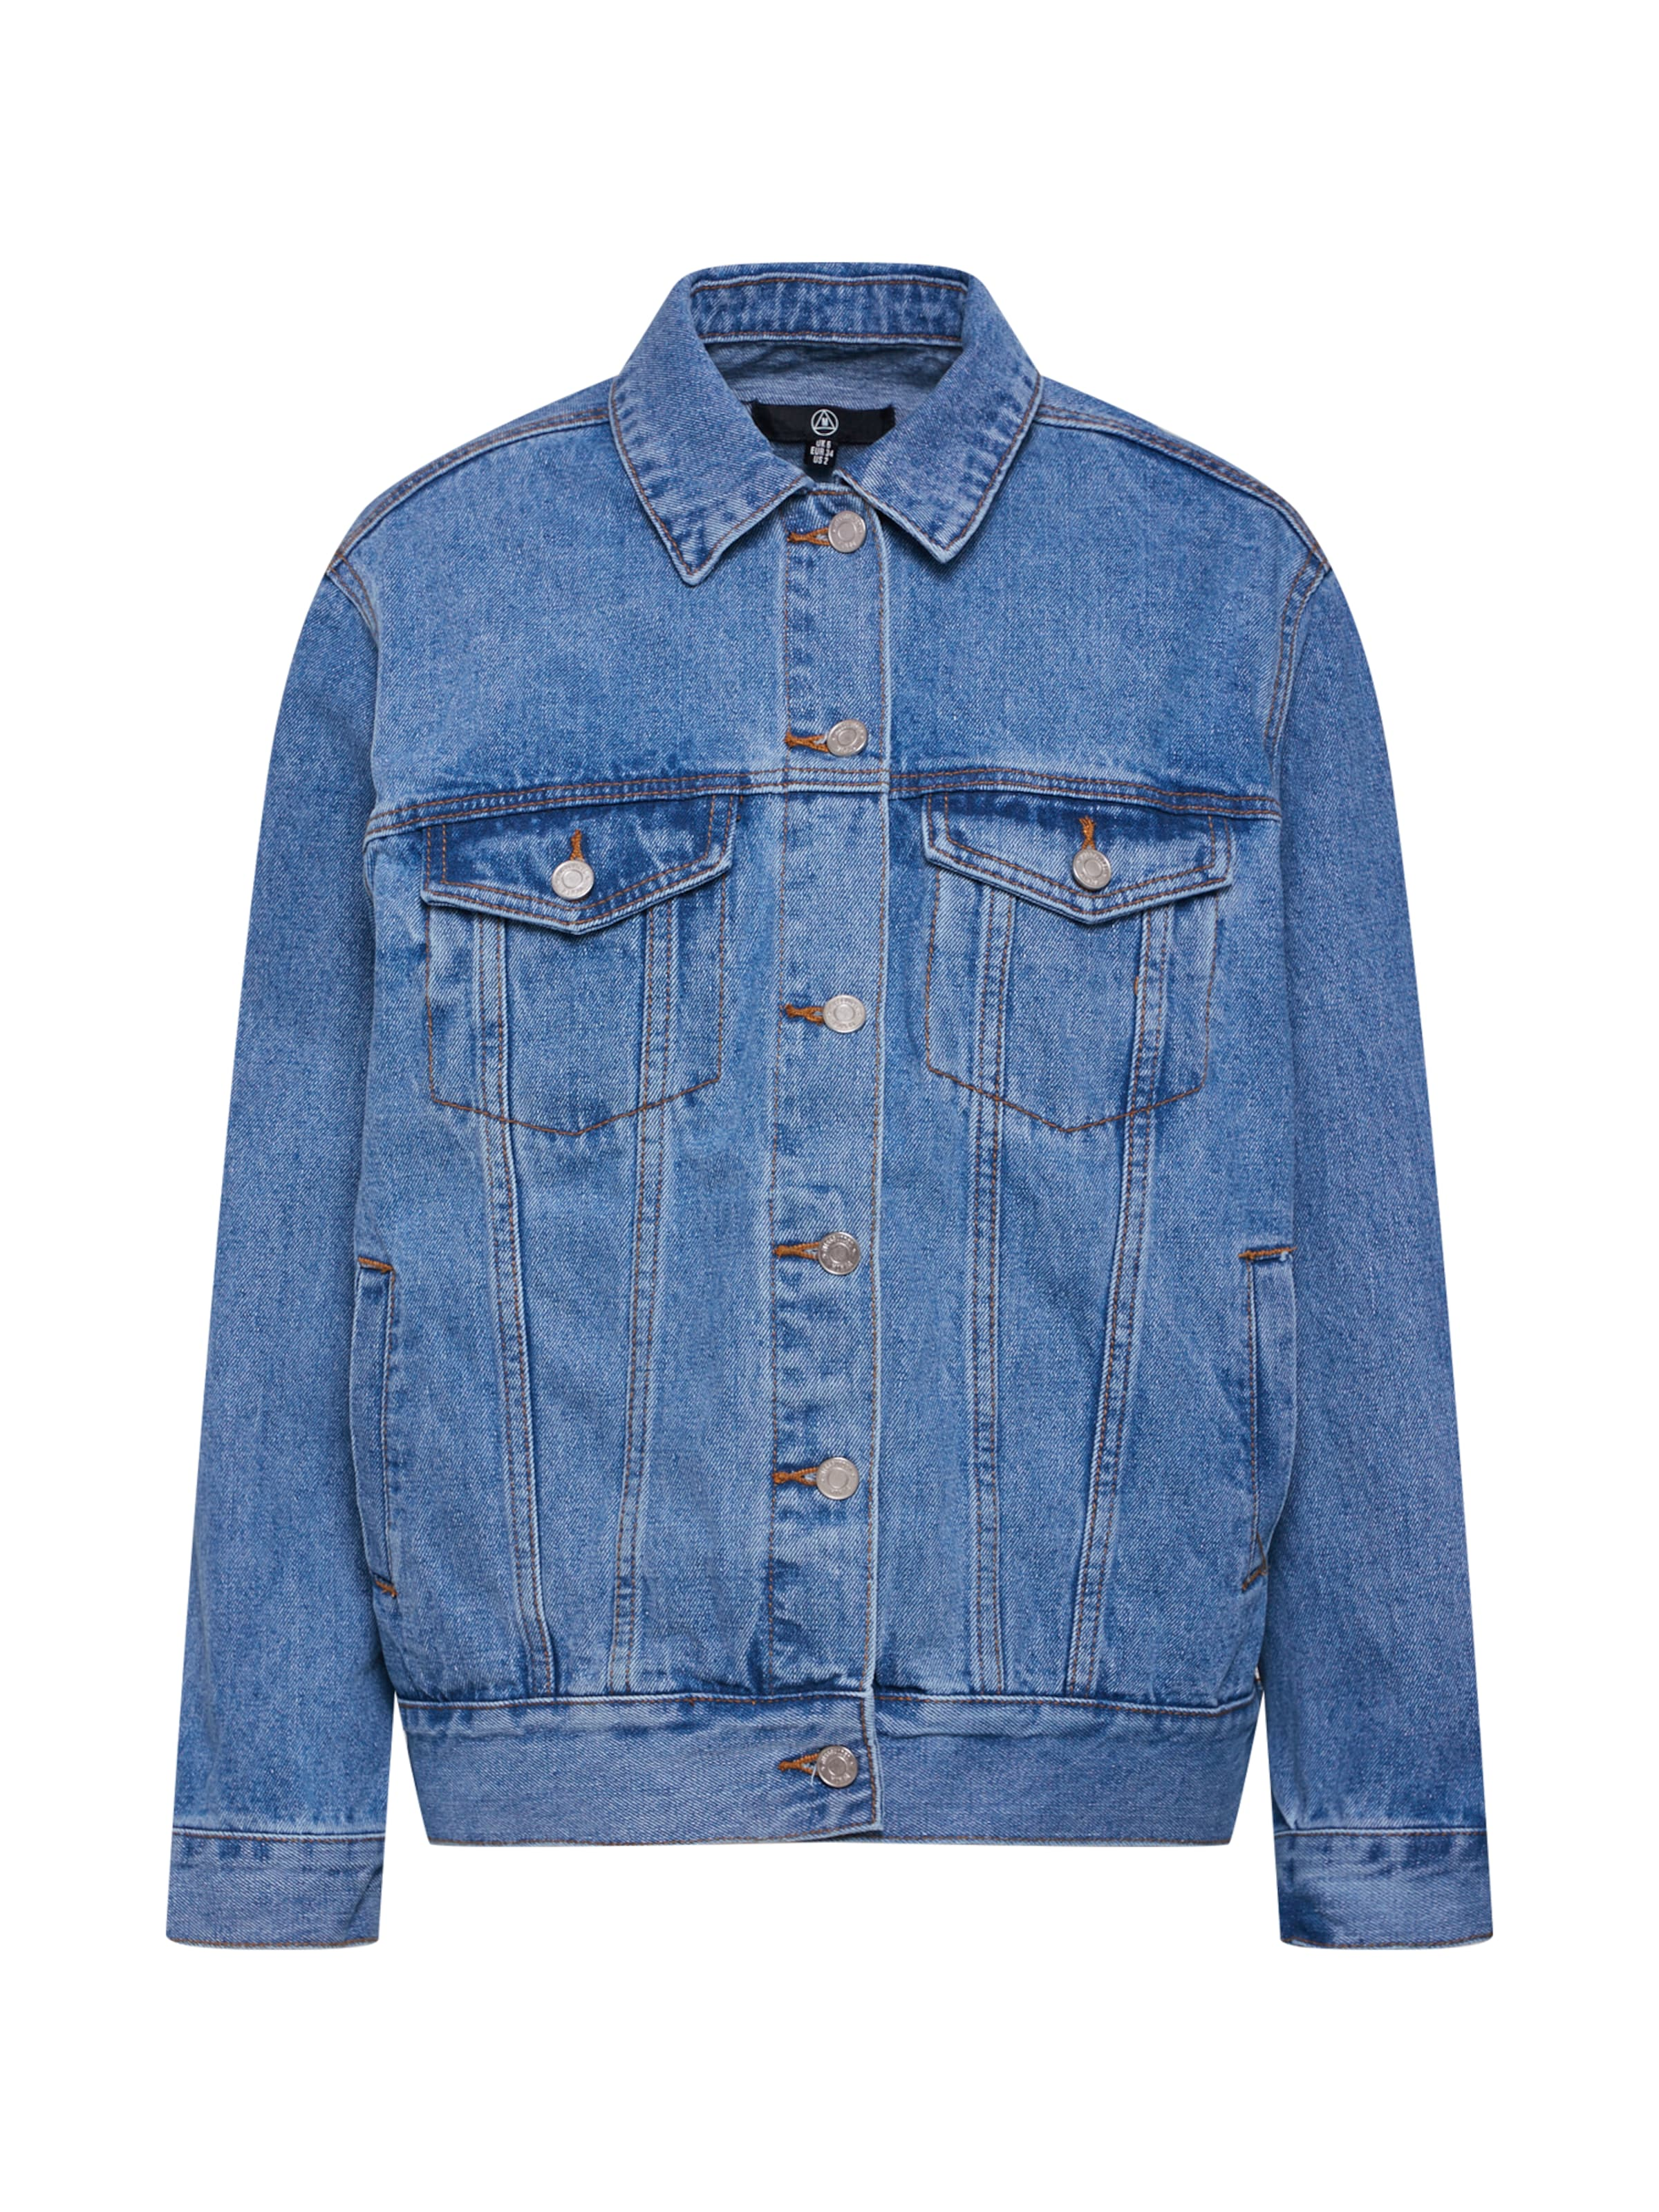 In Blue 'oversized Jacket' Jacke Denim Missguided 5LR4Aj3